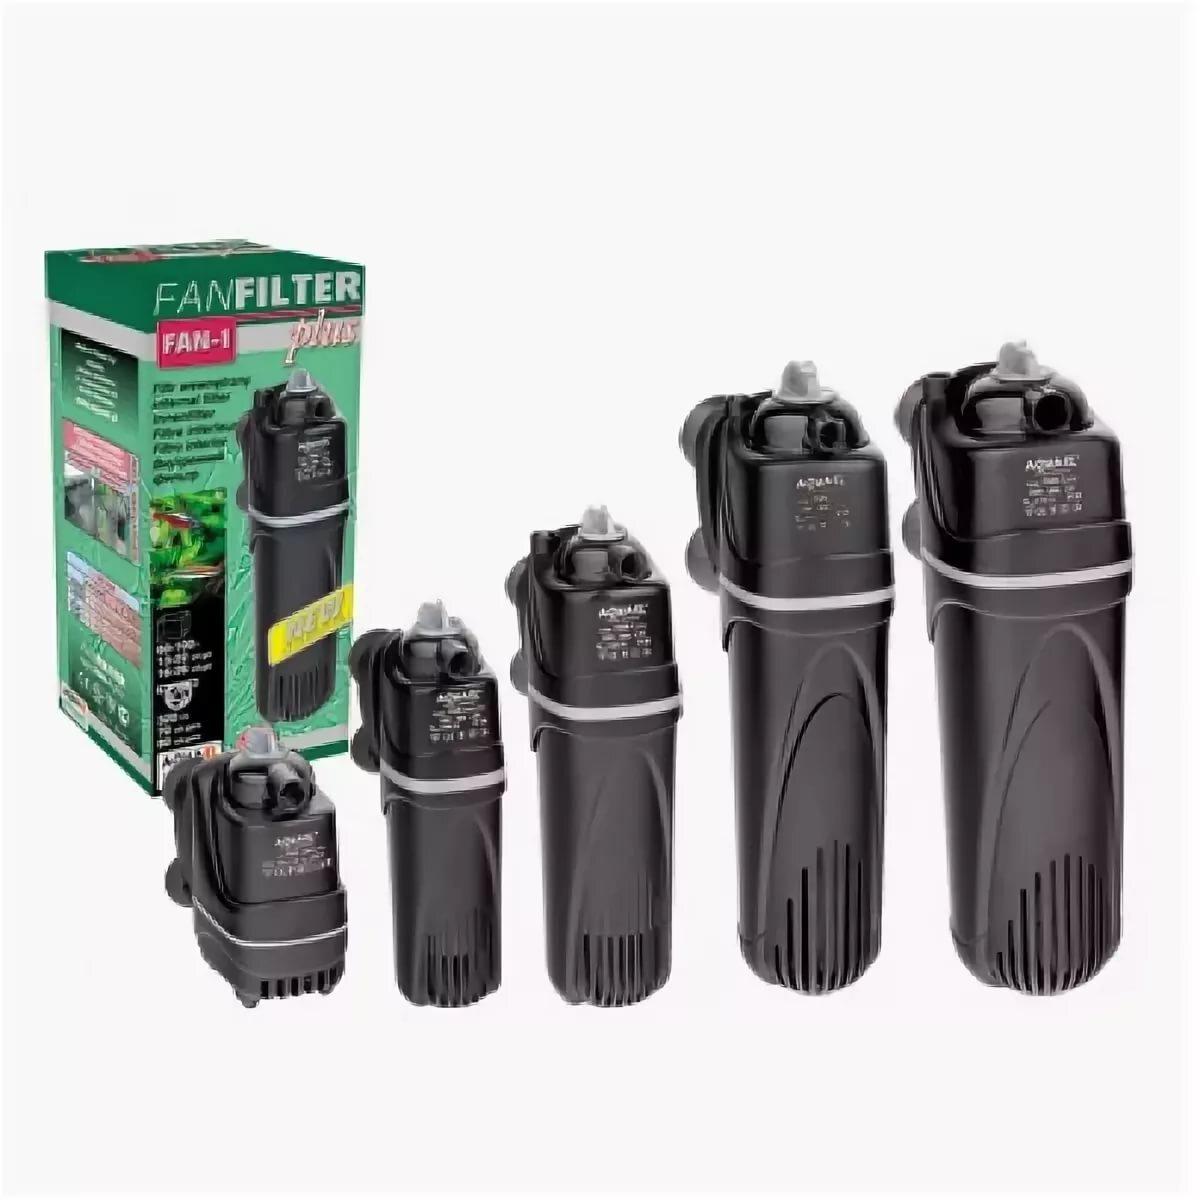 Помпа фильтр AQUAEL FAN-Micro PLUS (3л-30л) 250л/ч, 4 W, 0,3 кг